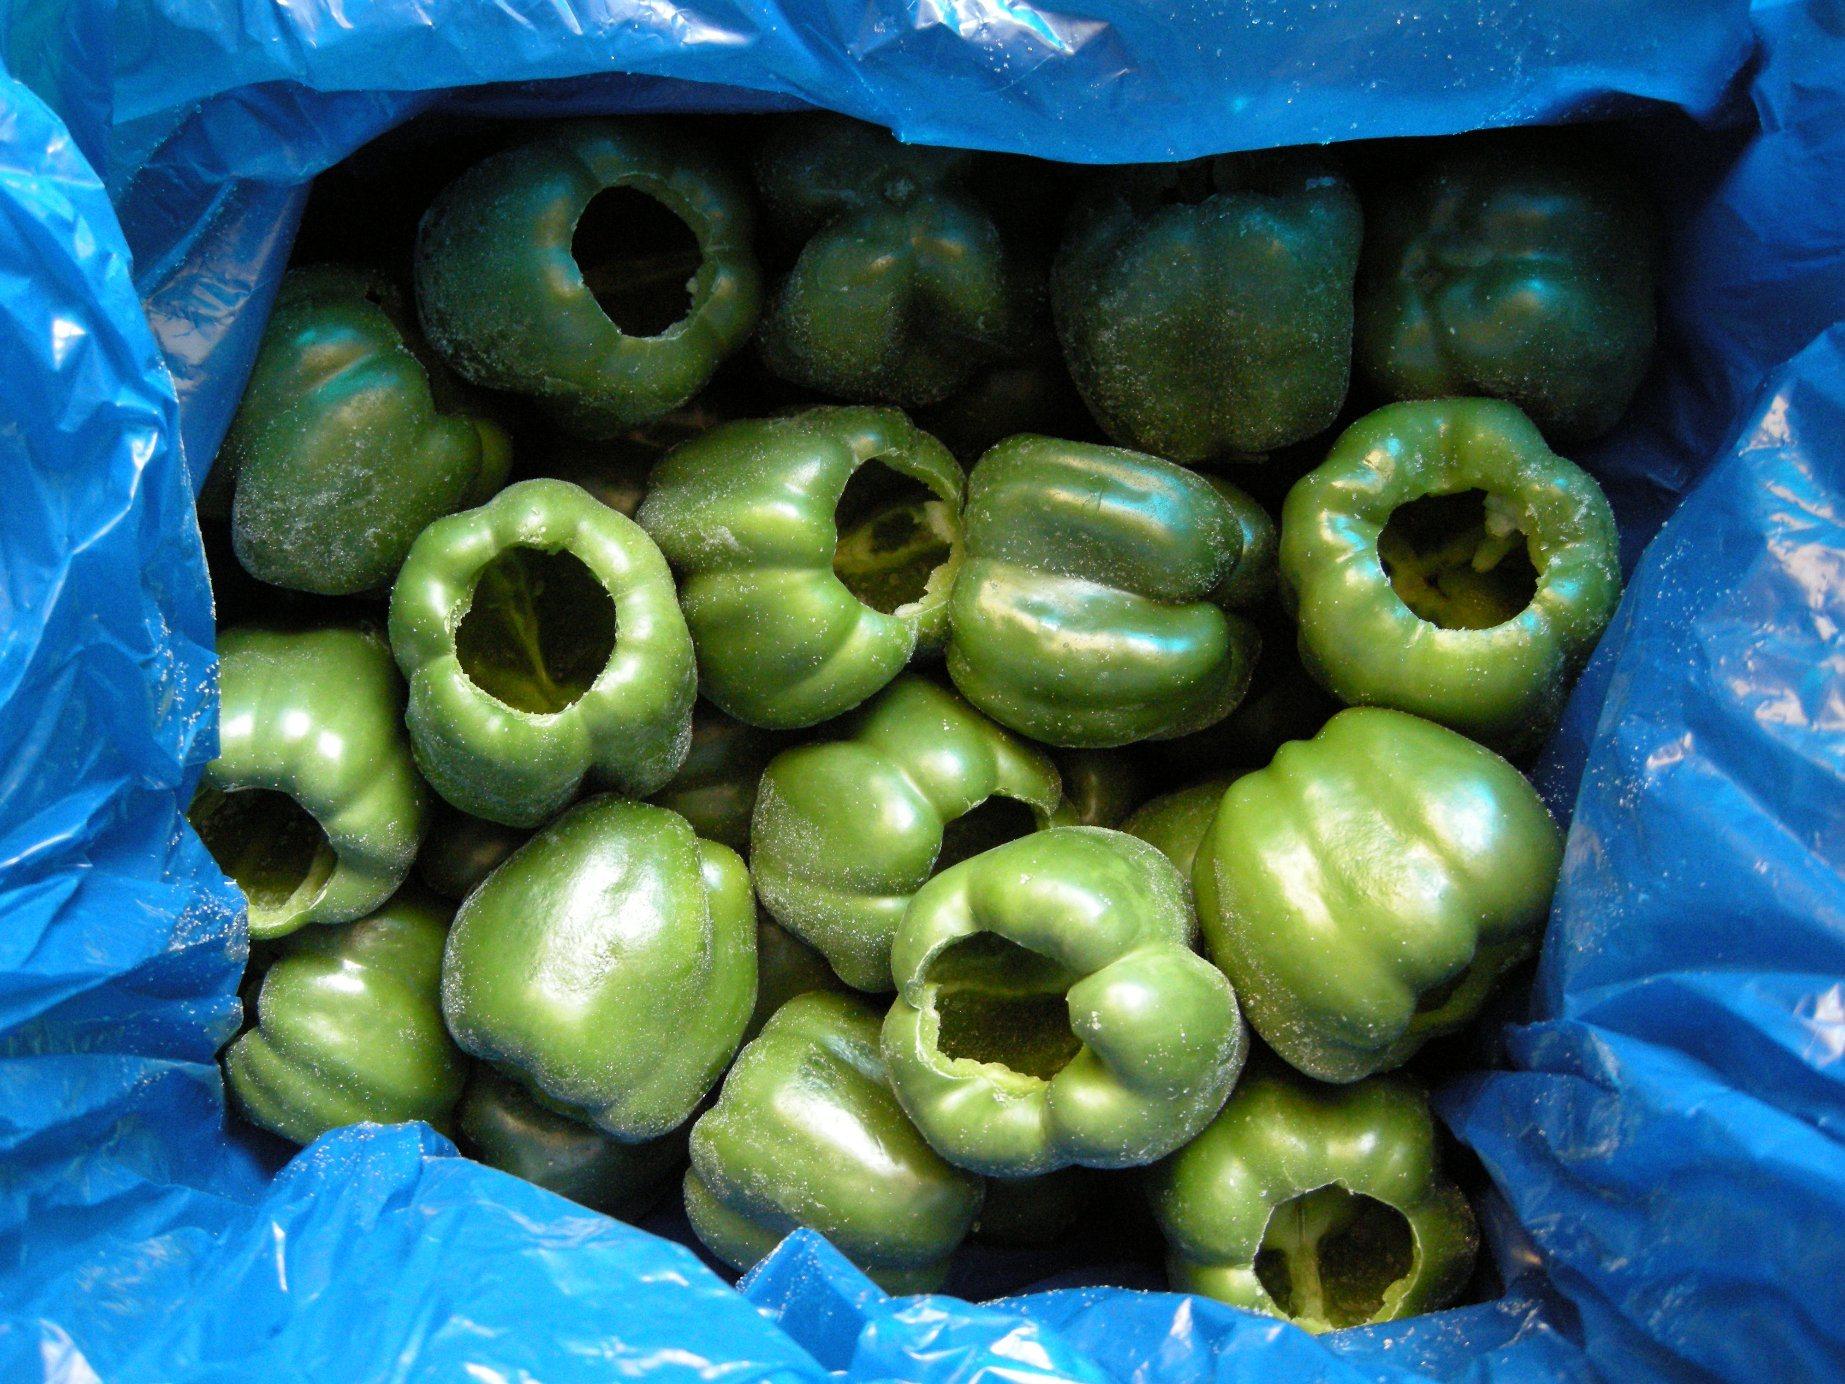 IQF Pepper or Frozen Pepper